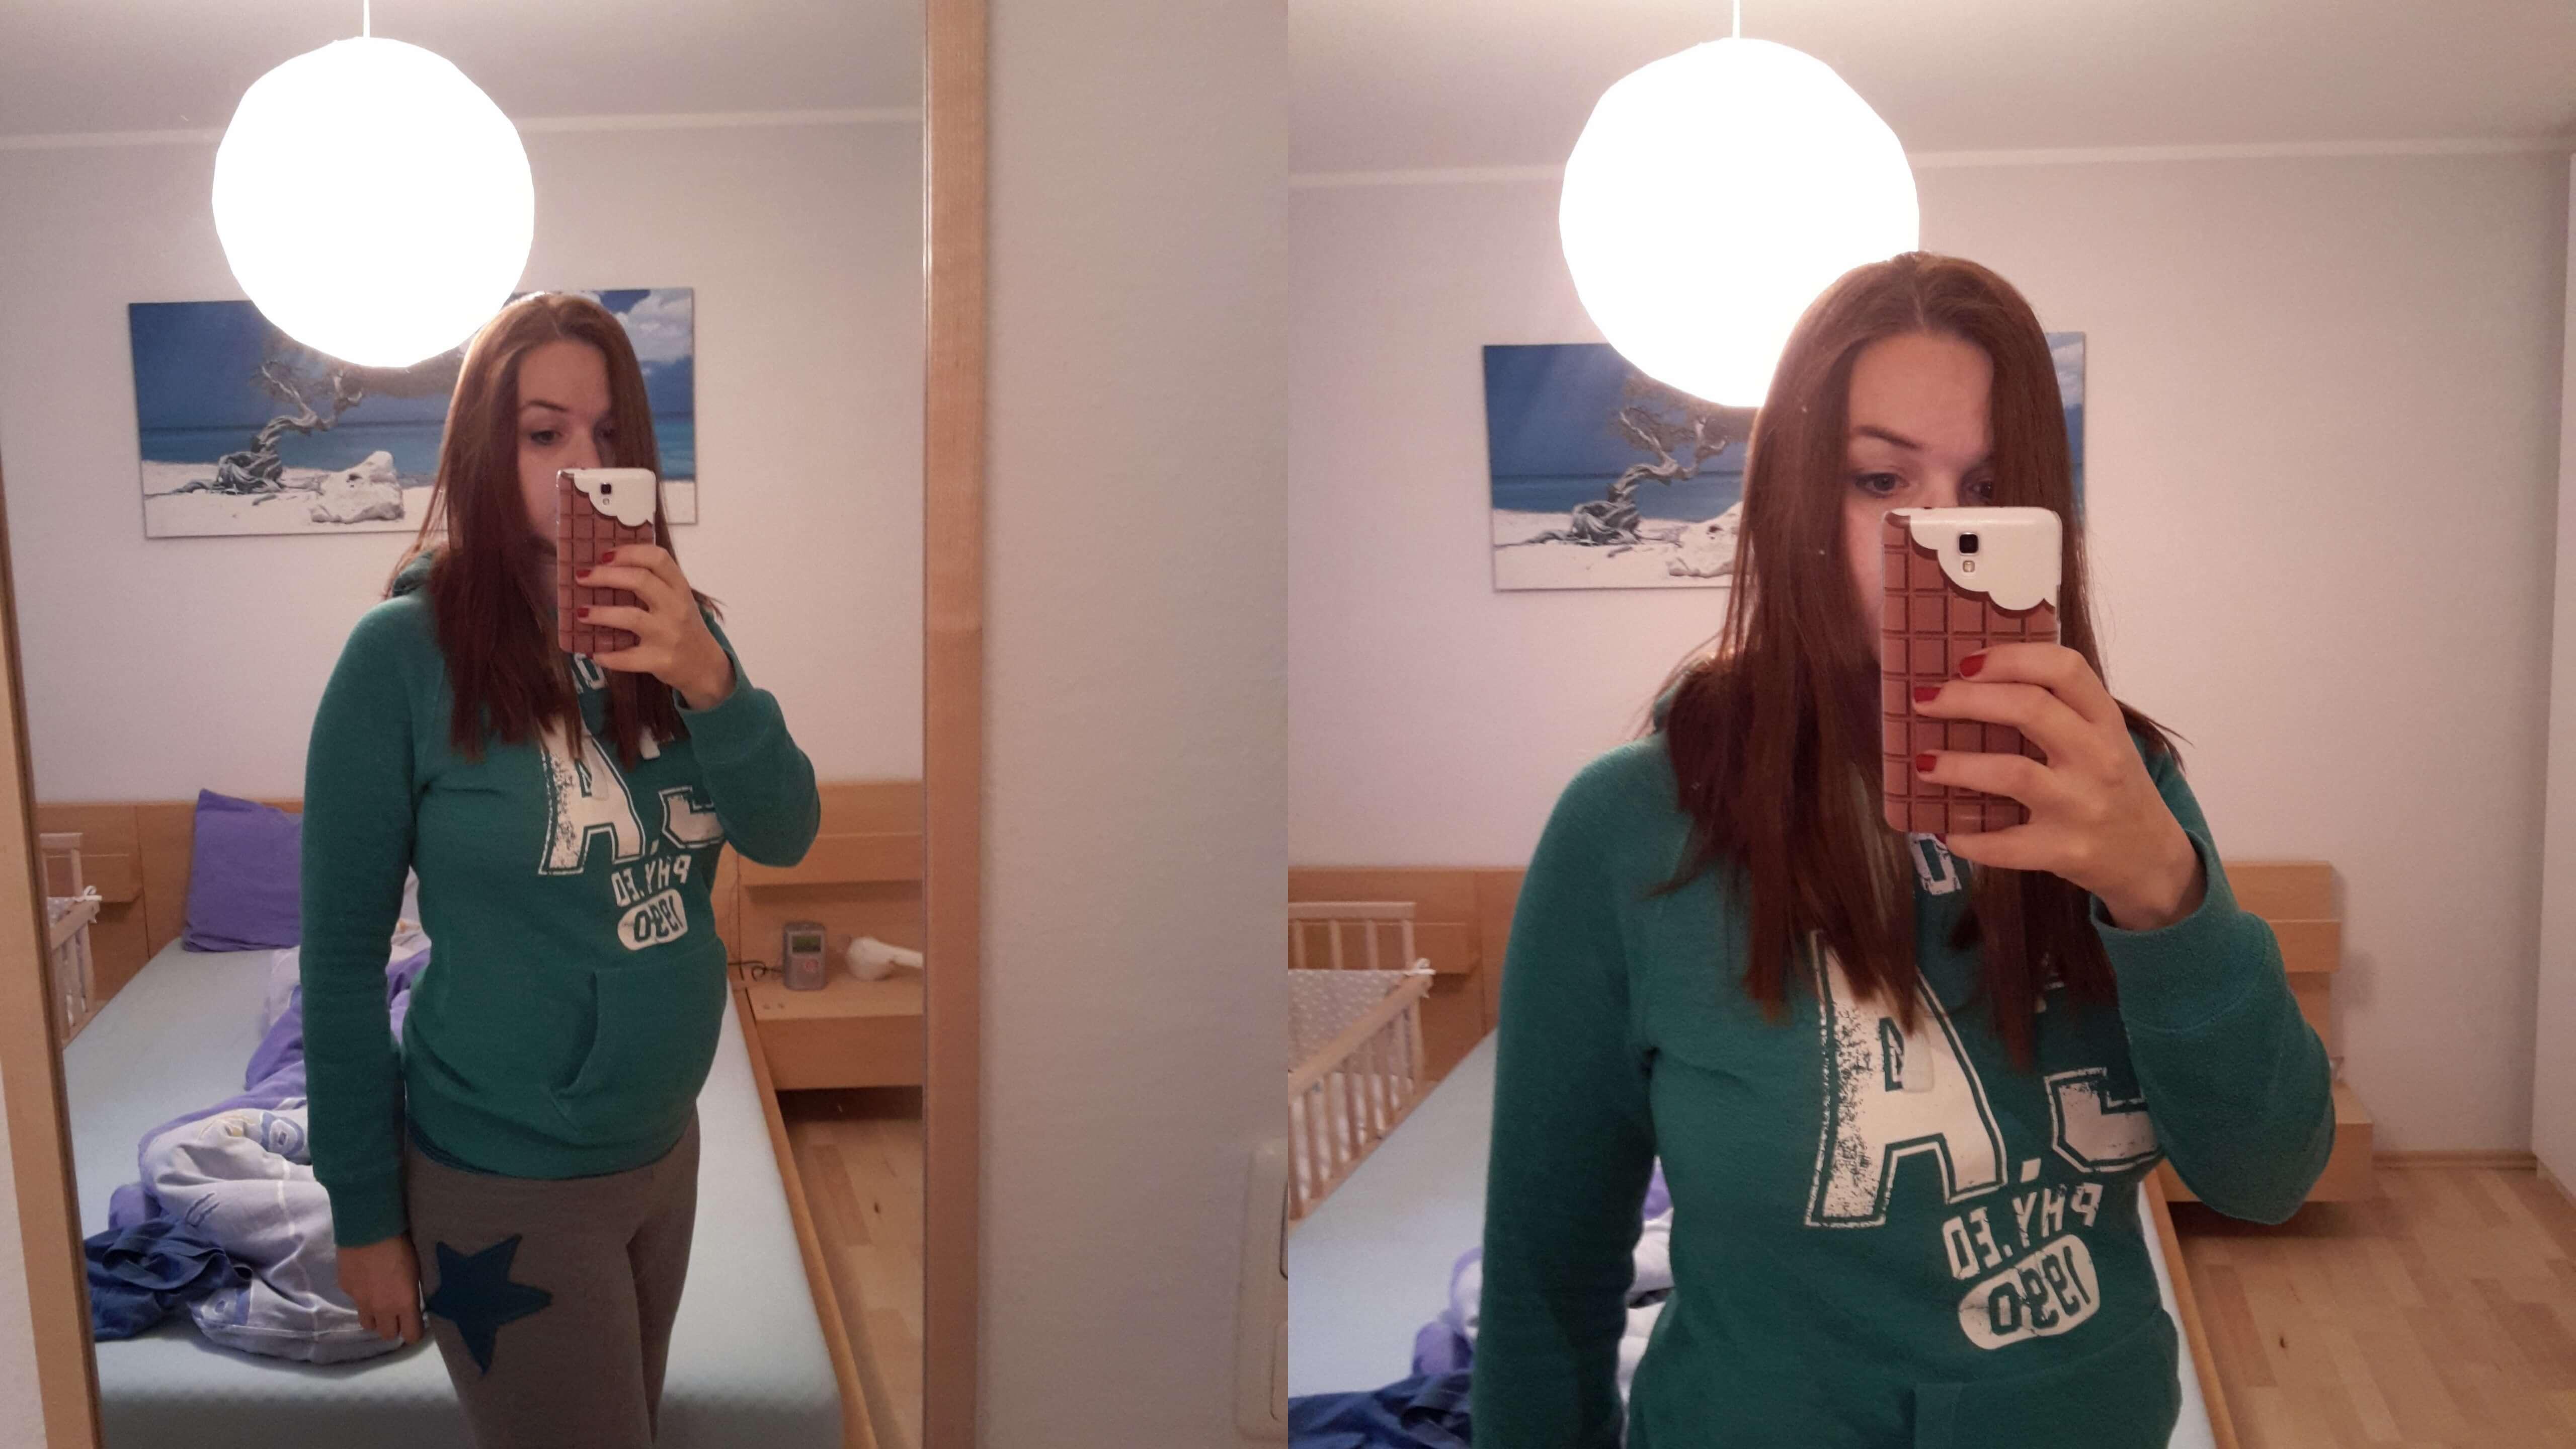 Spiegel Selfie Nov15